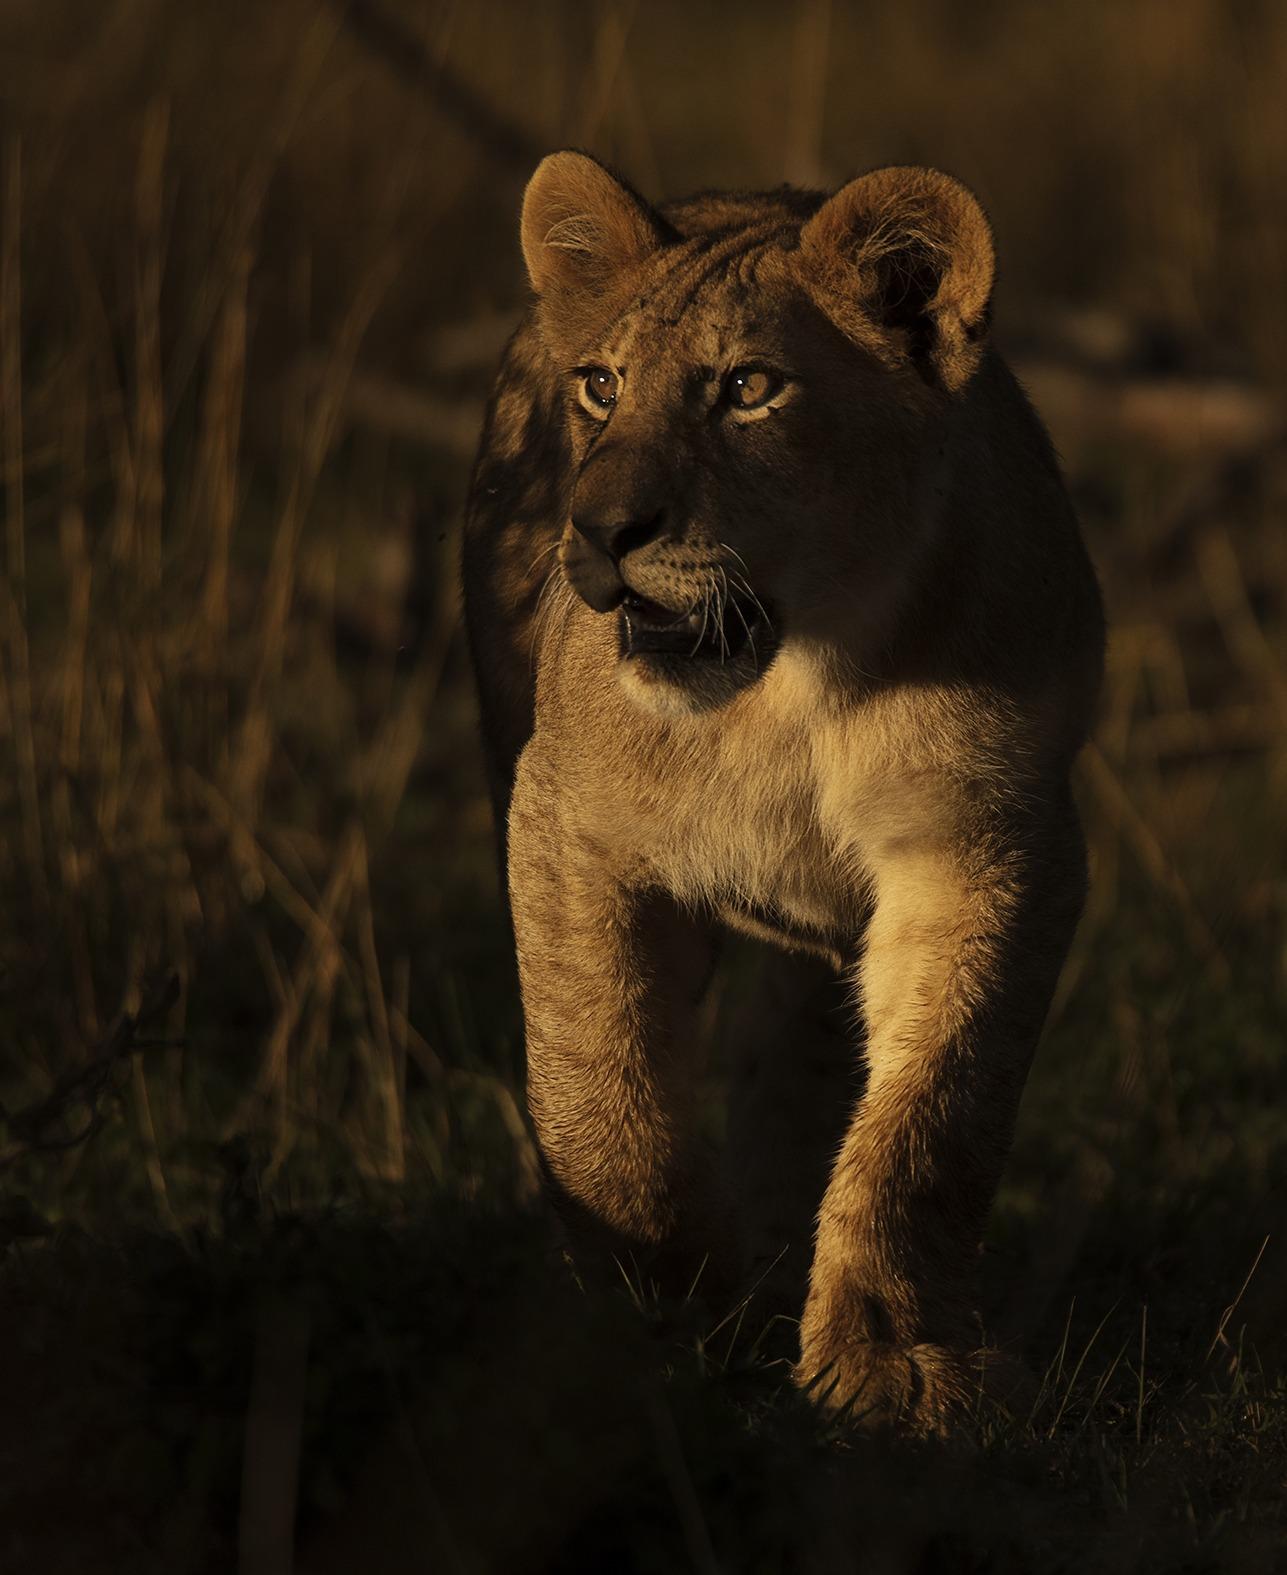 First Light on a lion cub in Maasai Mara on a ClementWild Photo Safari